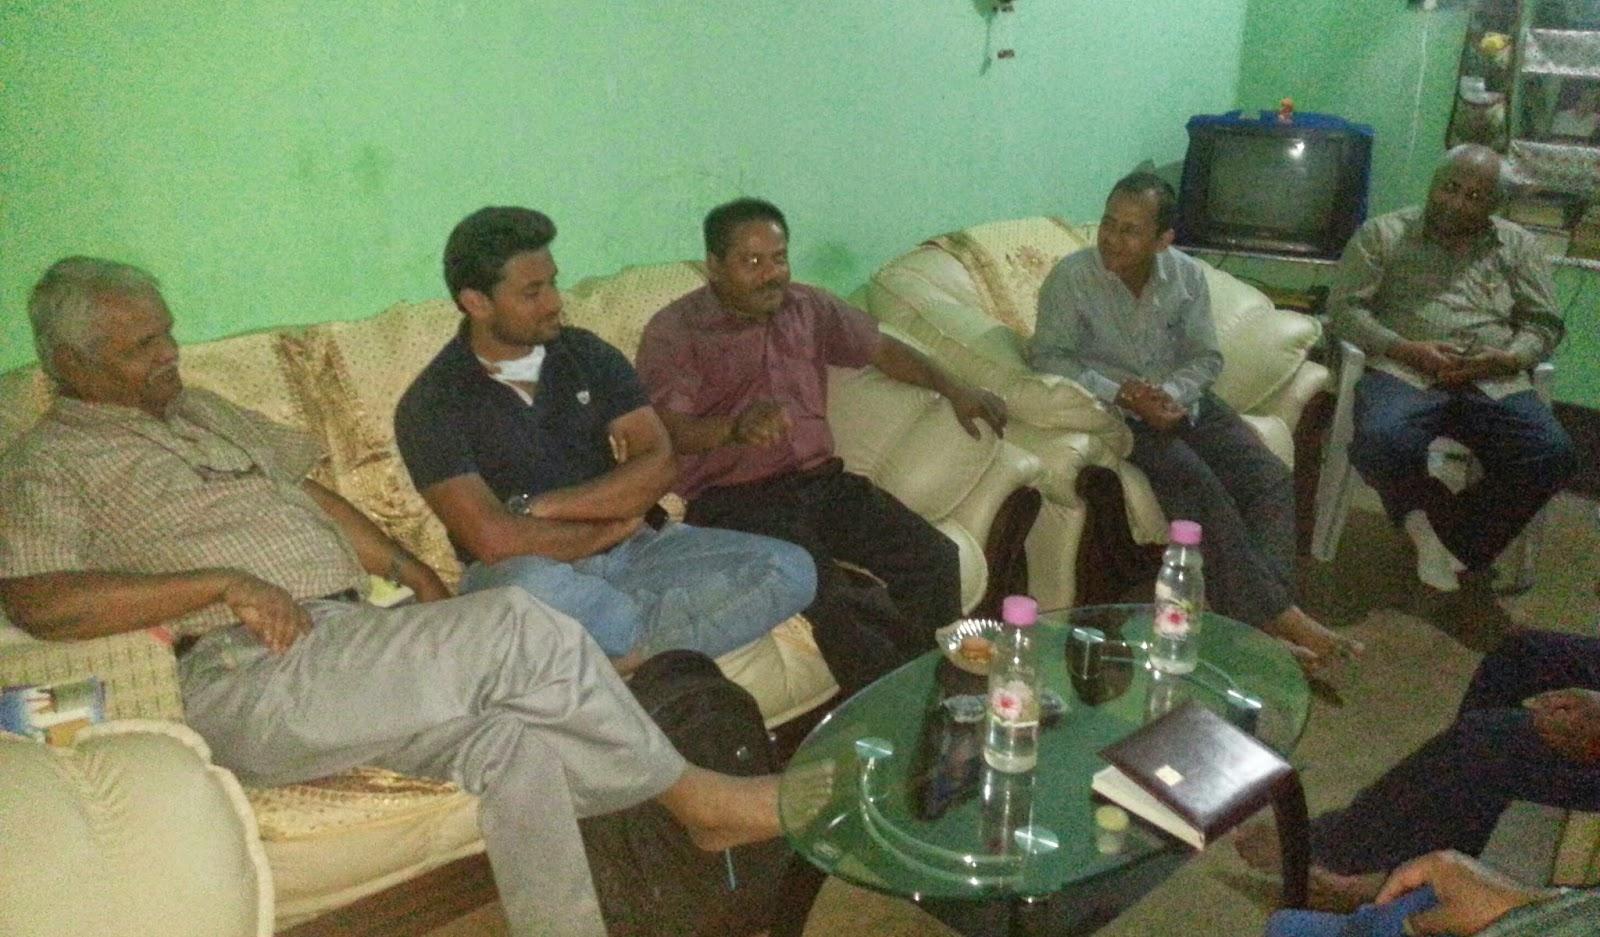 साहित्यिक संस्था 'देसिल बयना'क मासिक बैसार